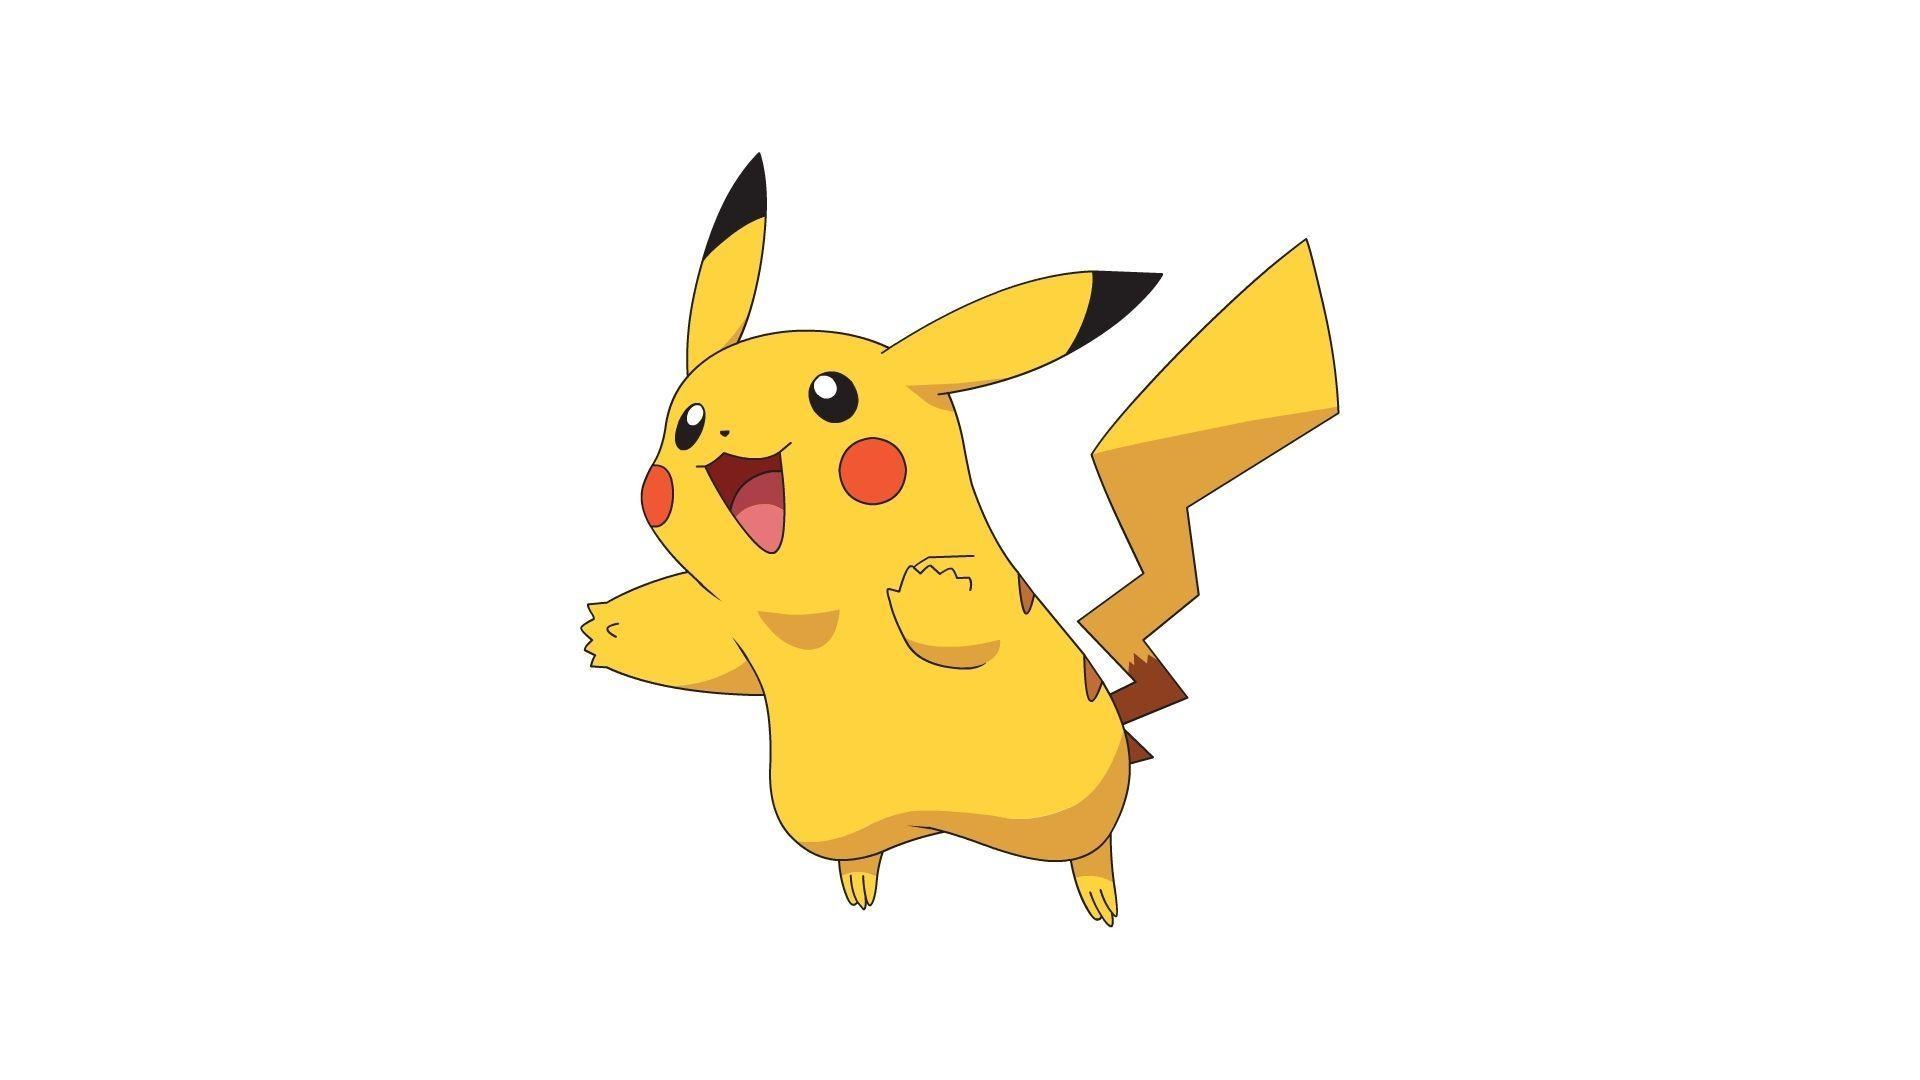 Animals For > Cute Pikachu Pokemon Wallpaper